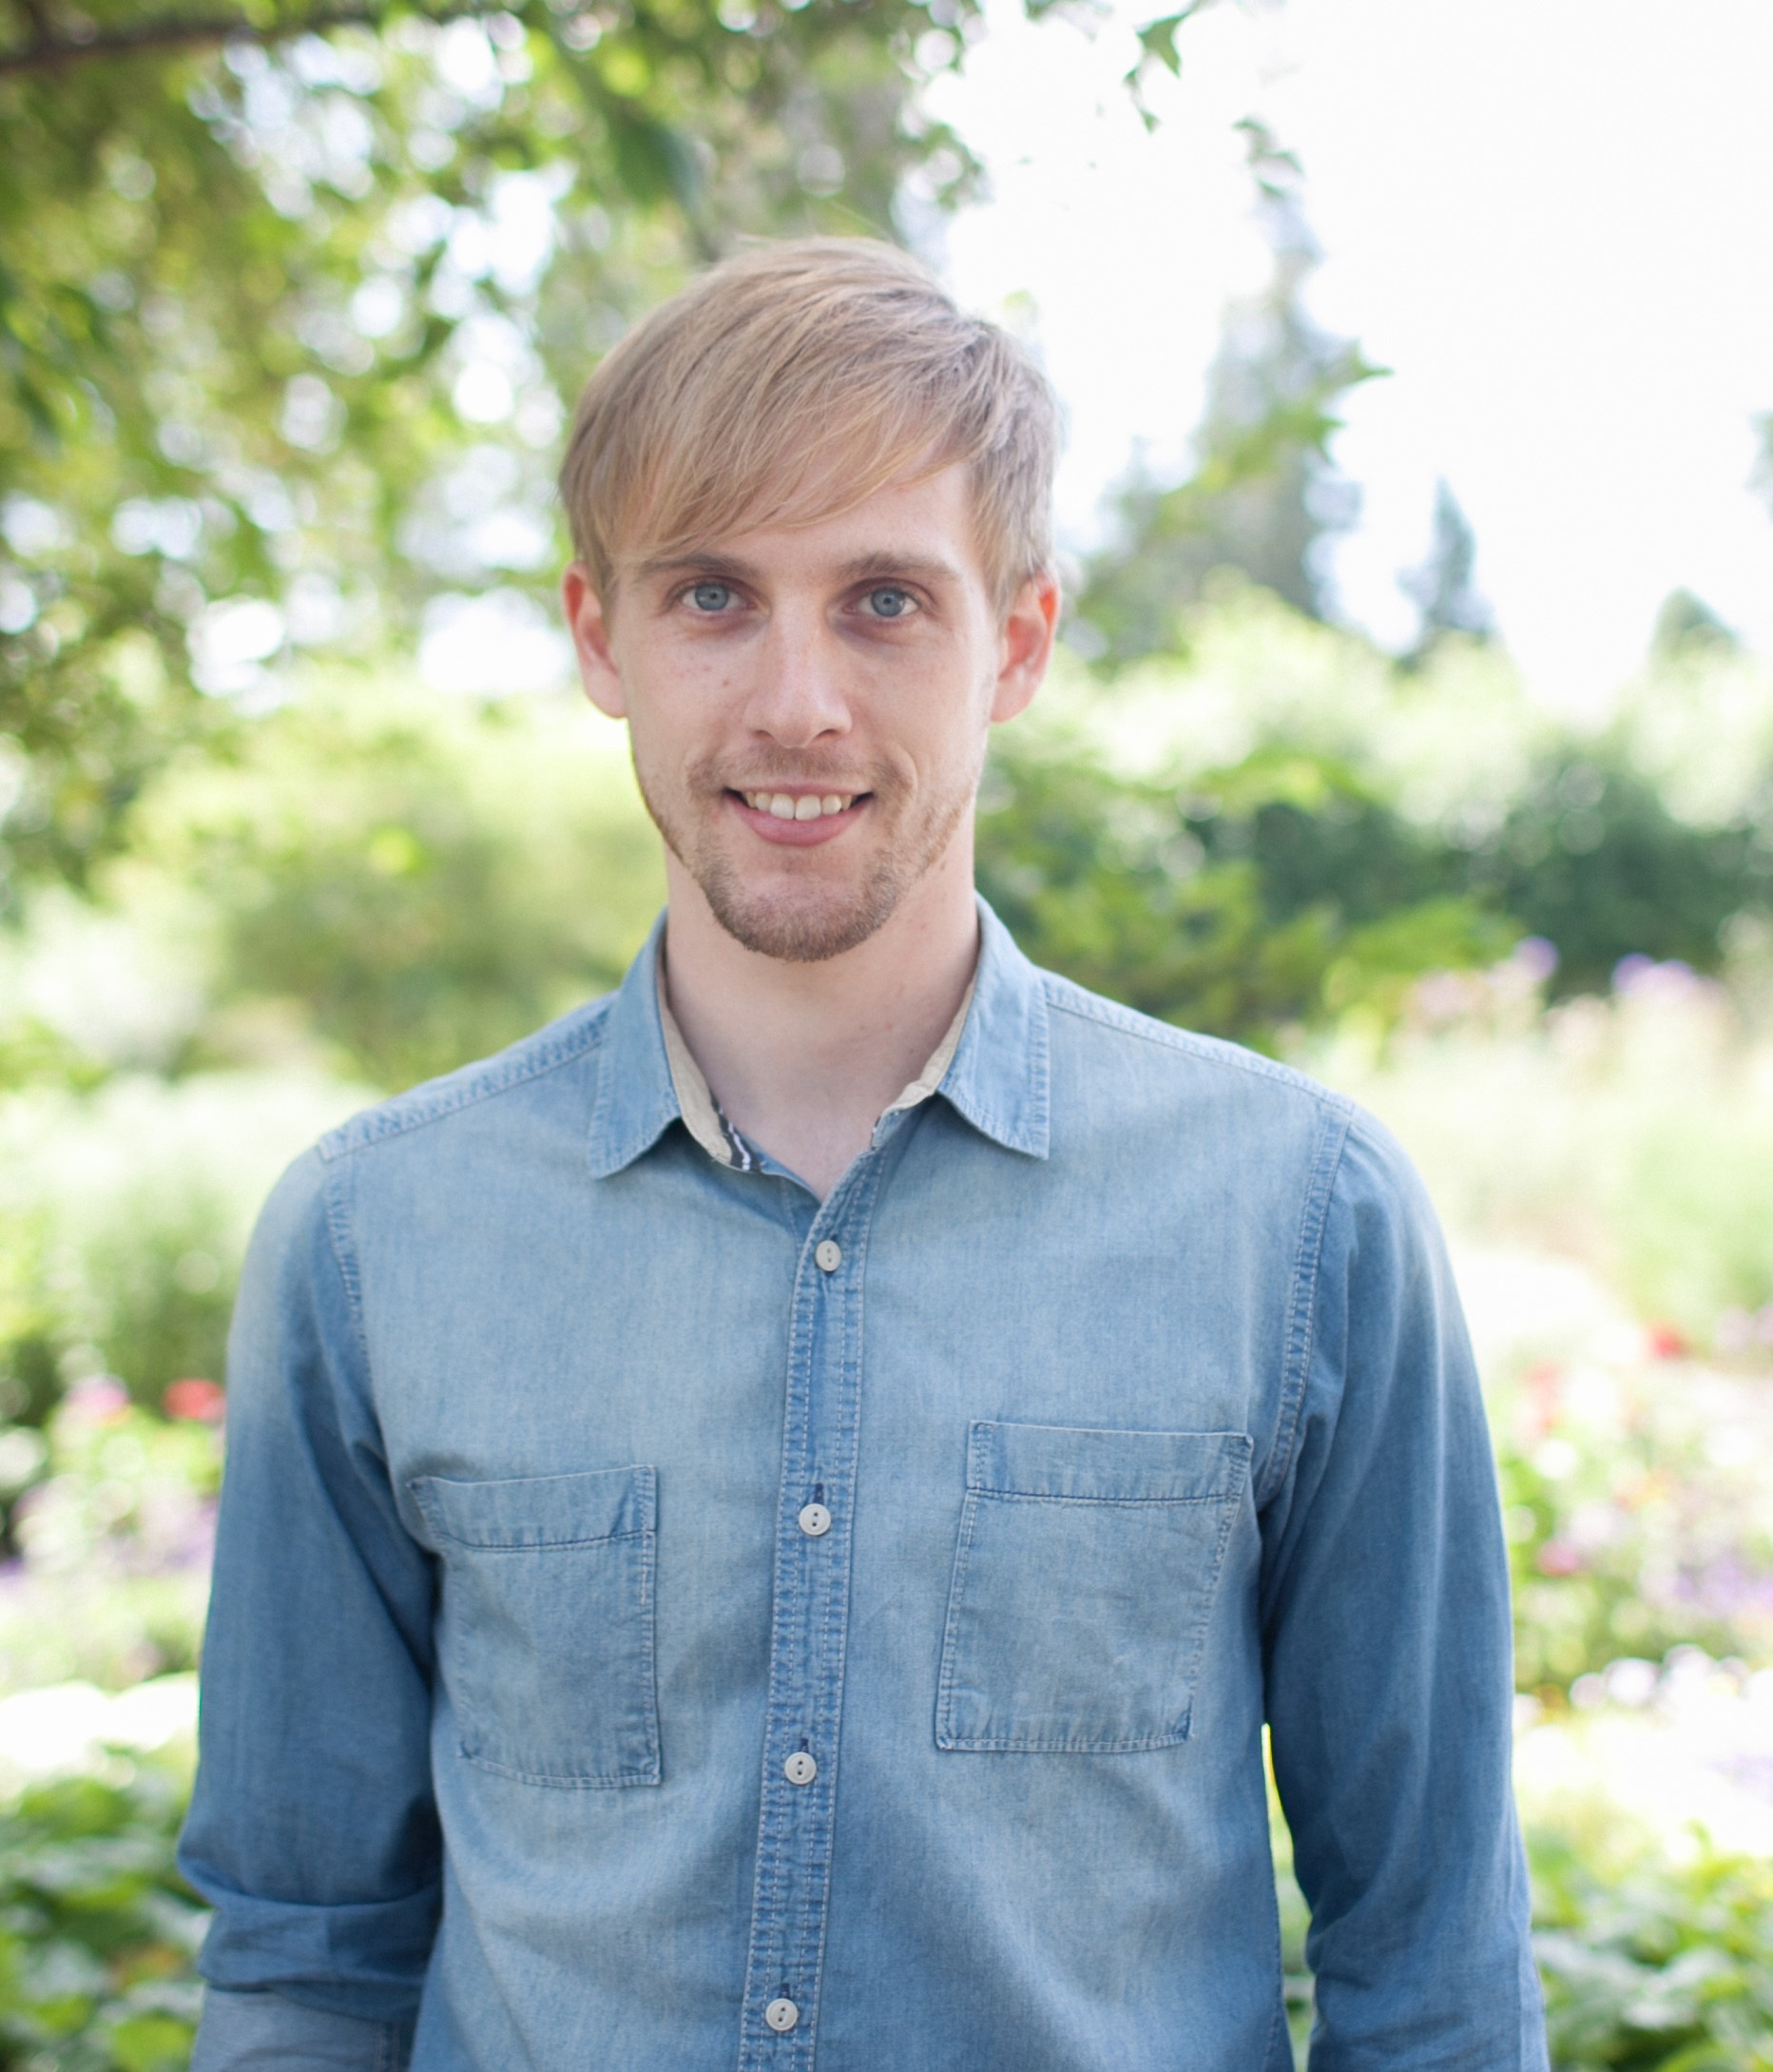 Profilbild Michi Naumann